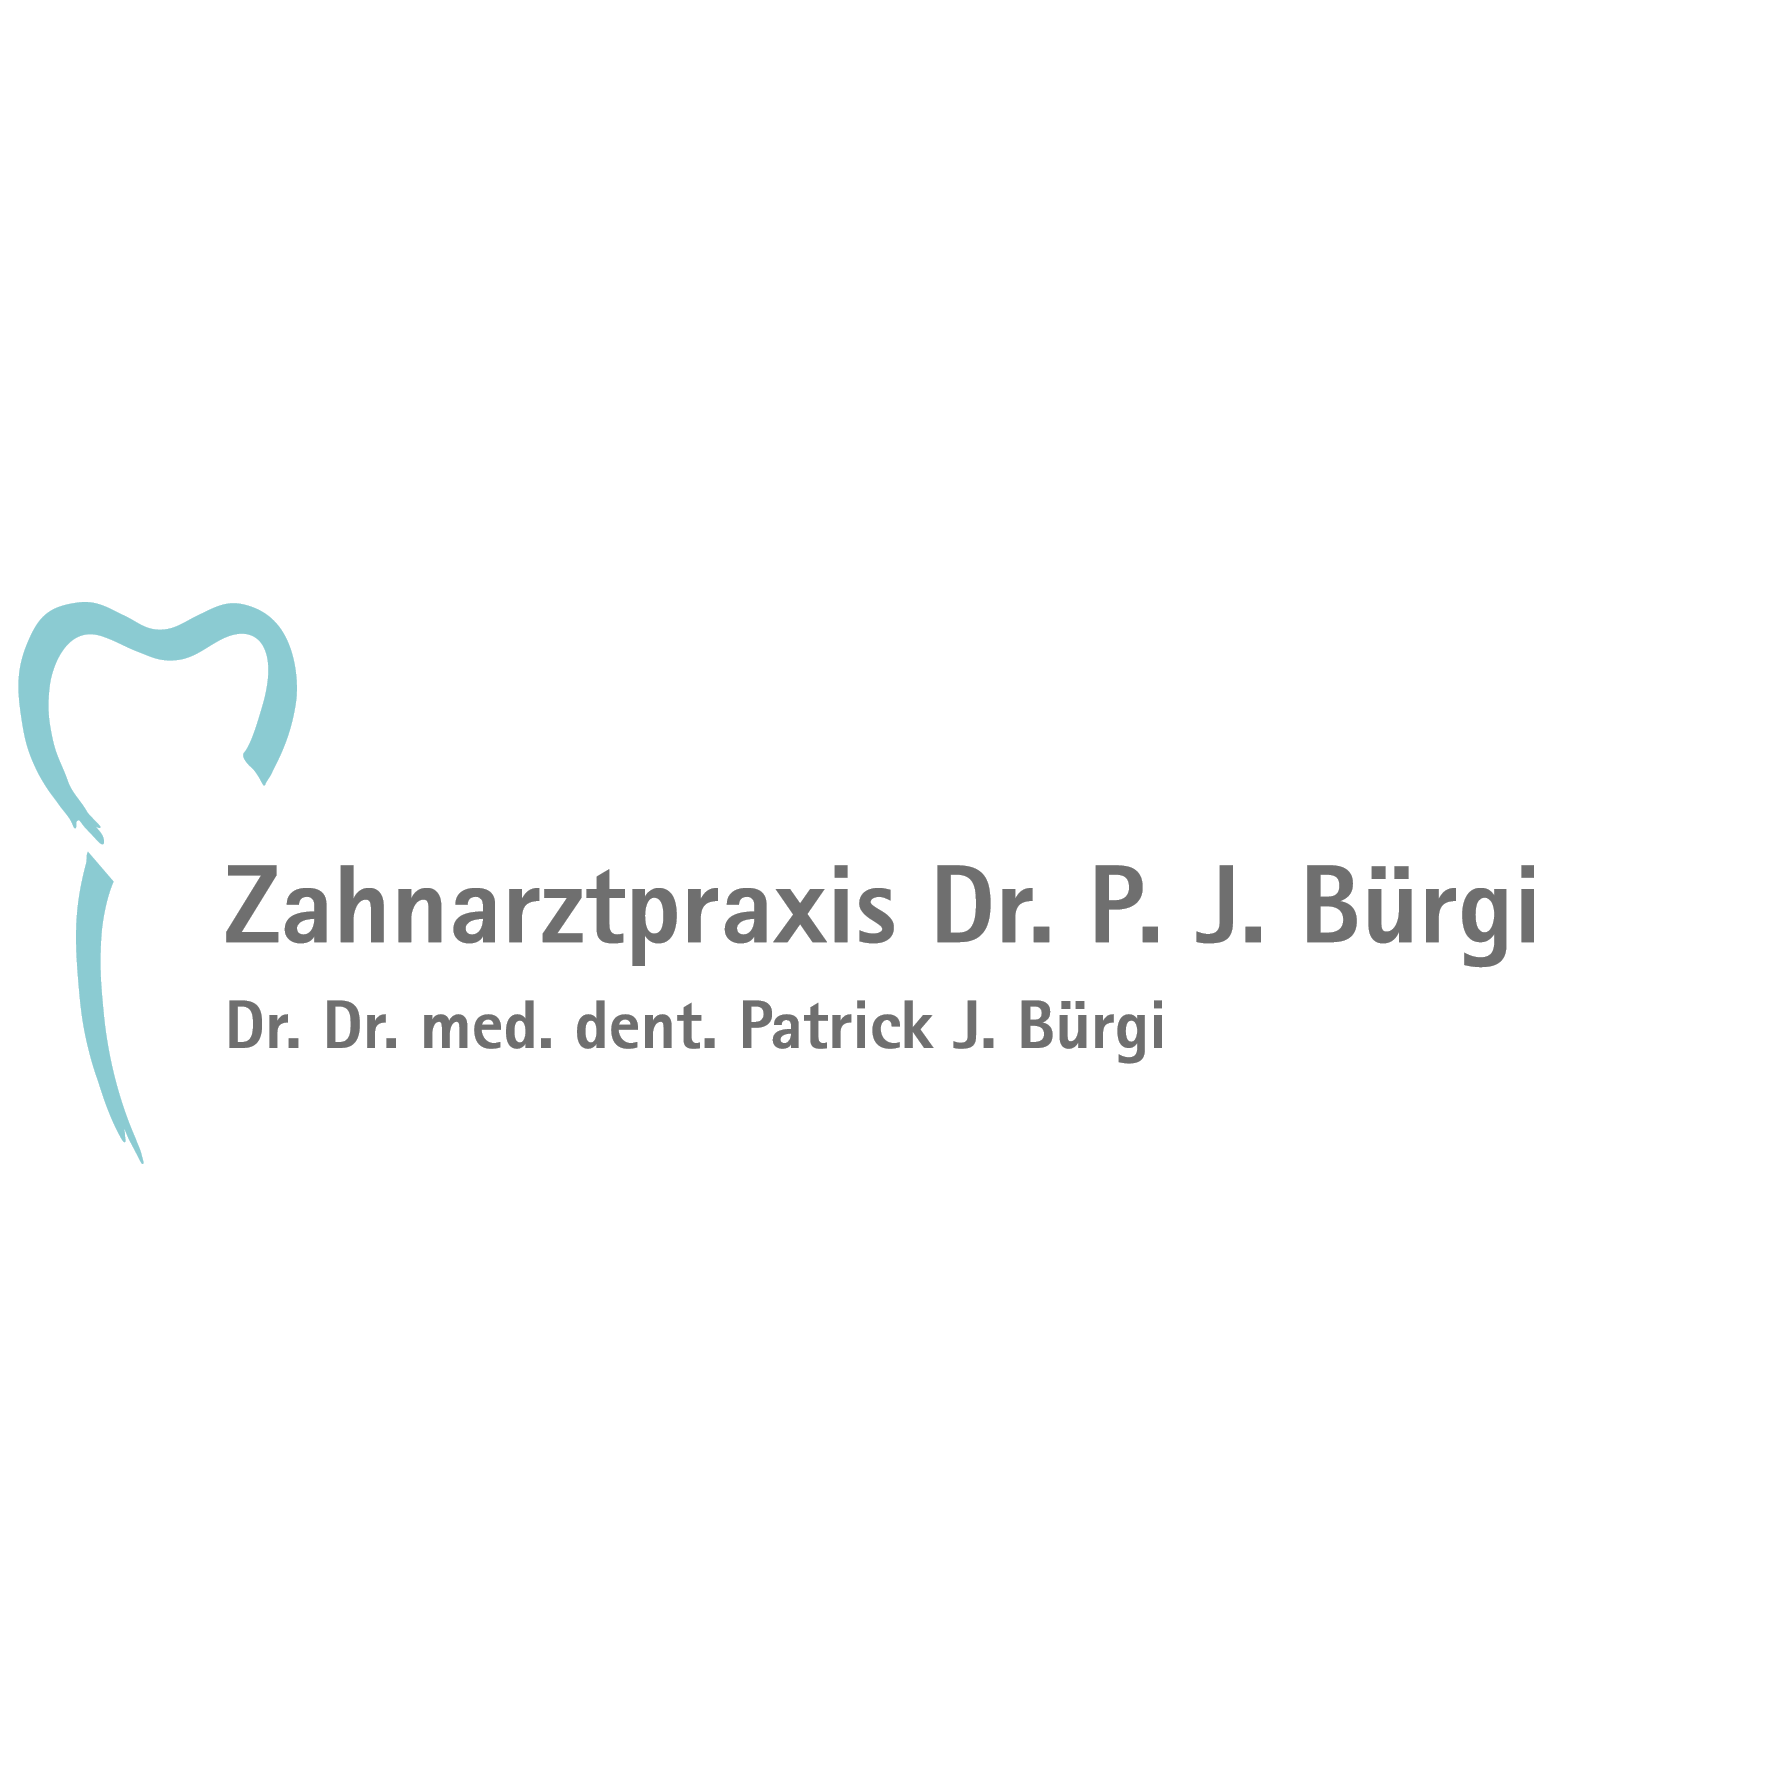 Zahnarztpraxis Dr. Dr. P. J. Bürgi